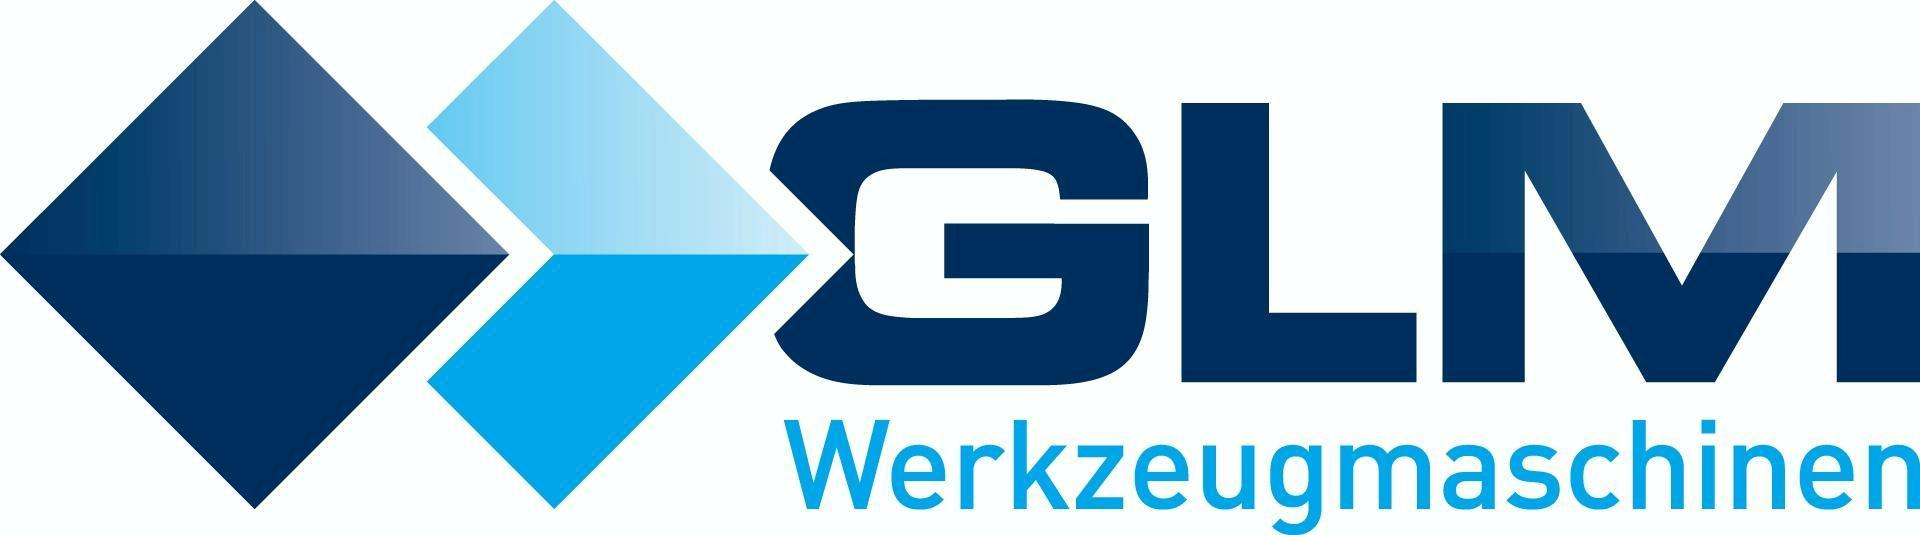 GLM- Service u. Vertrieb GmbH & Co. KG